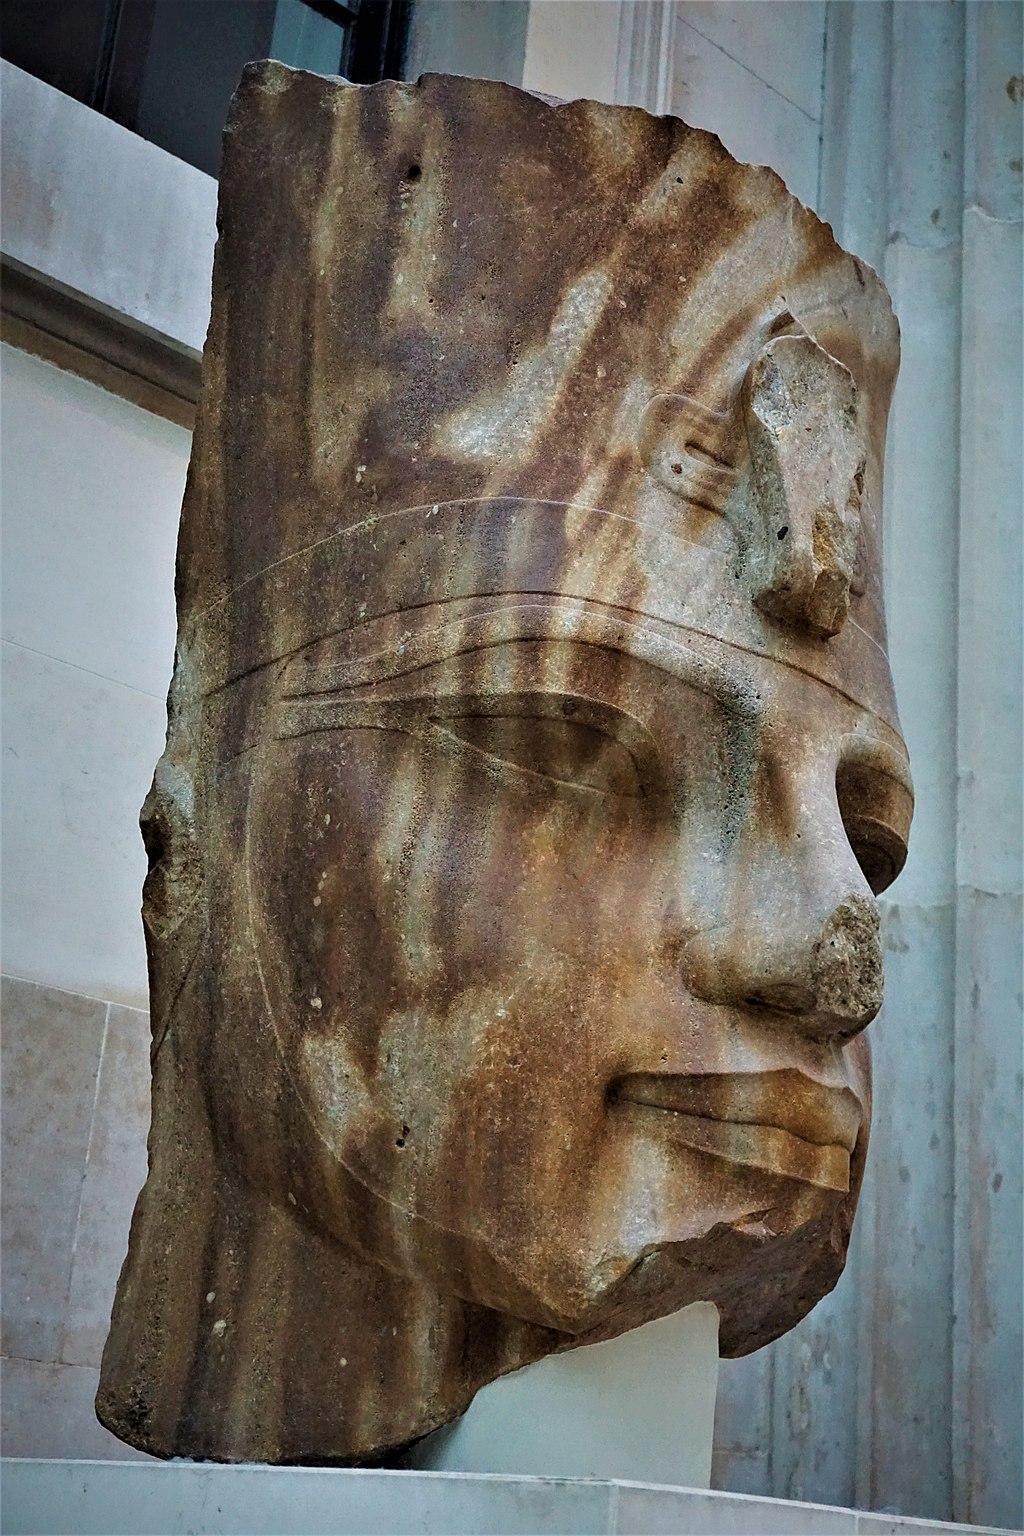 Quartzite Head of the Egyptian Pharaoh Amenhotep III - Joy of Museums